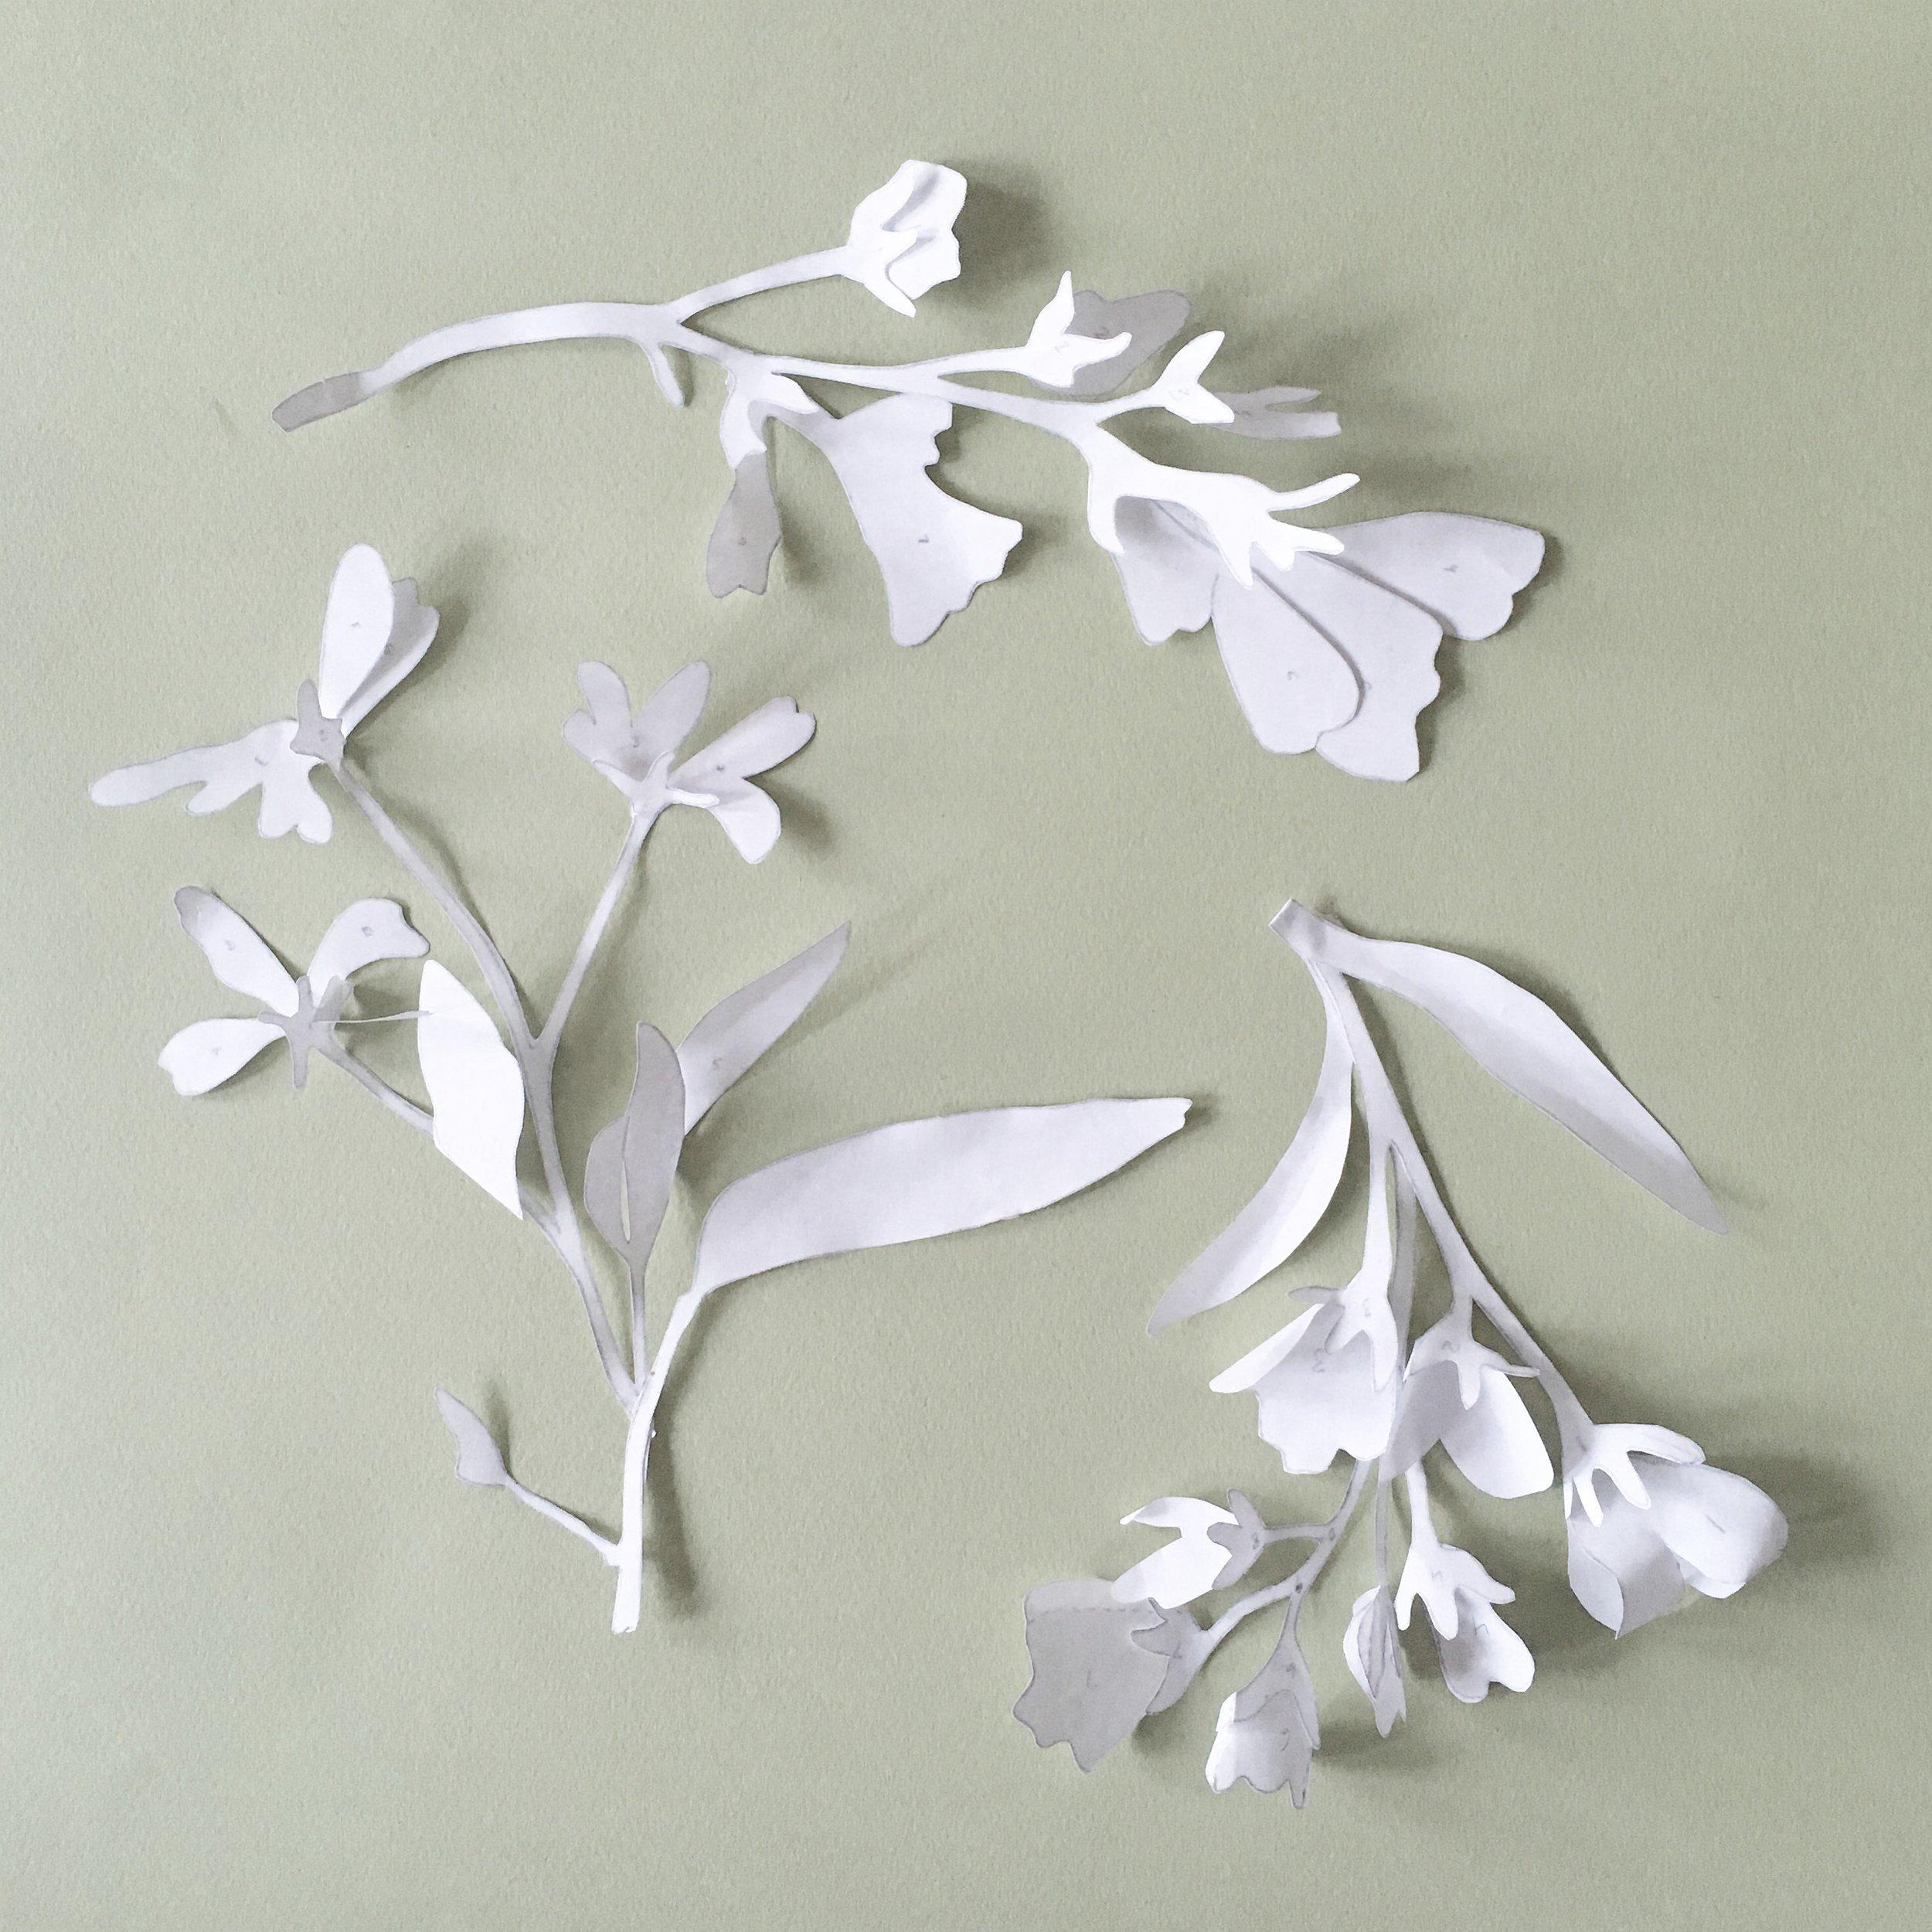 Flower paper models